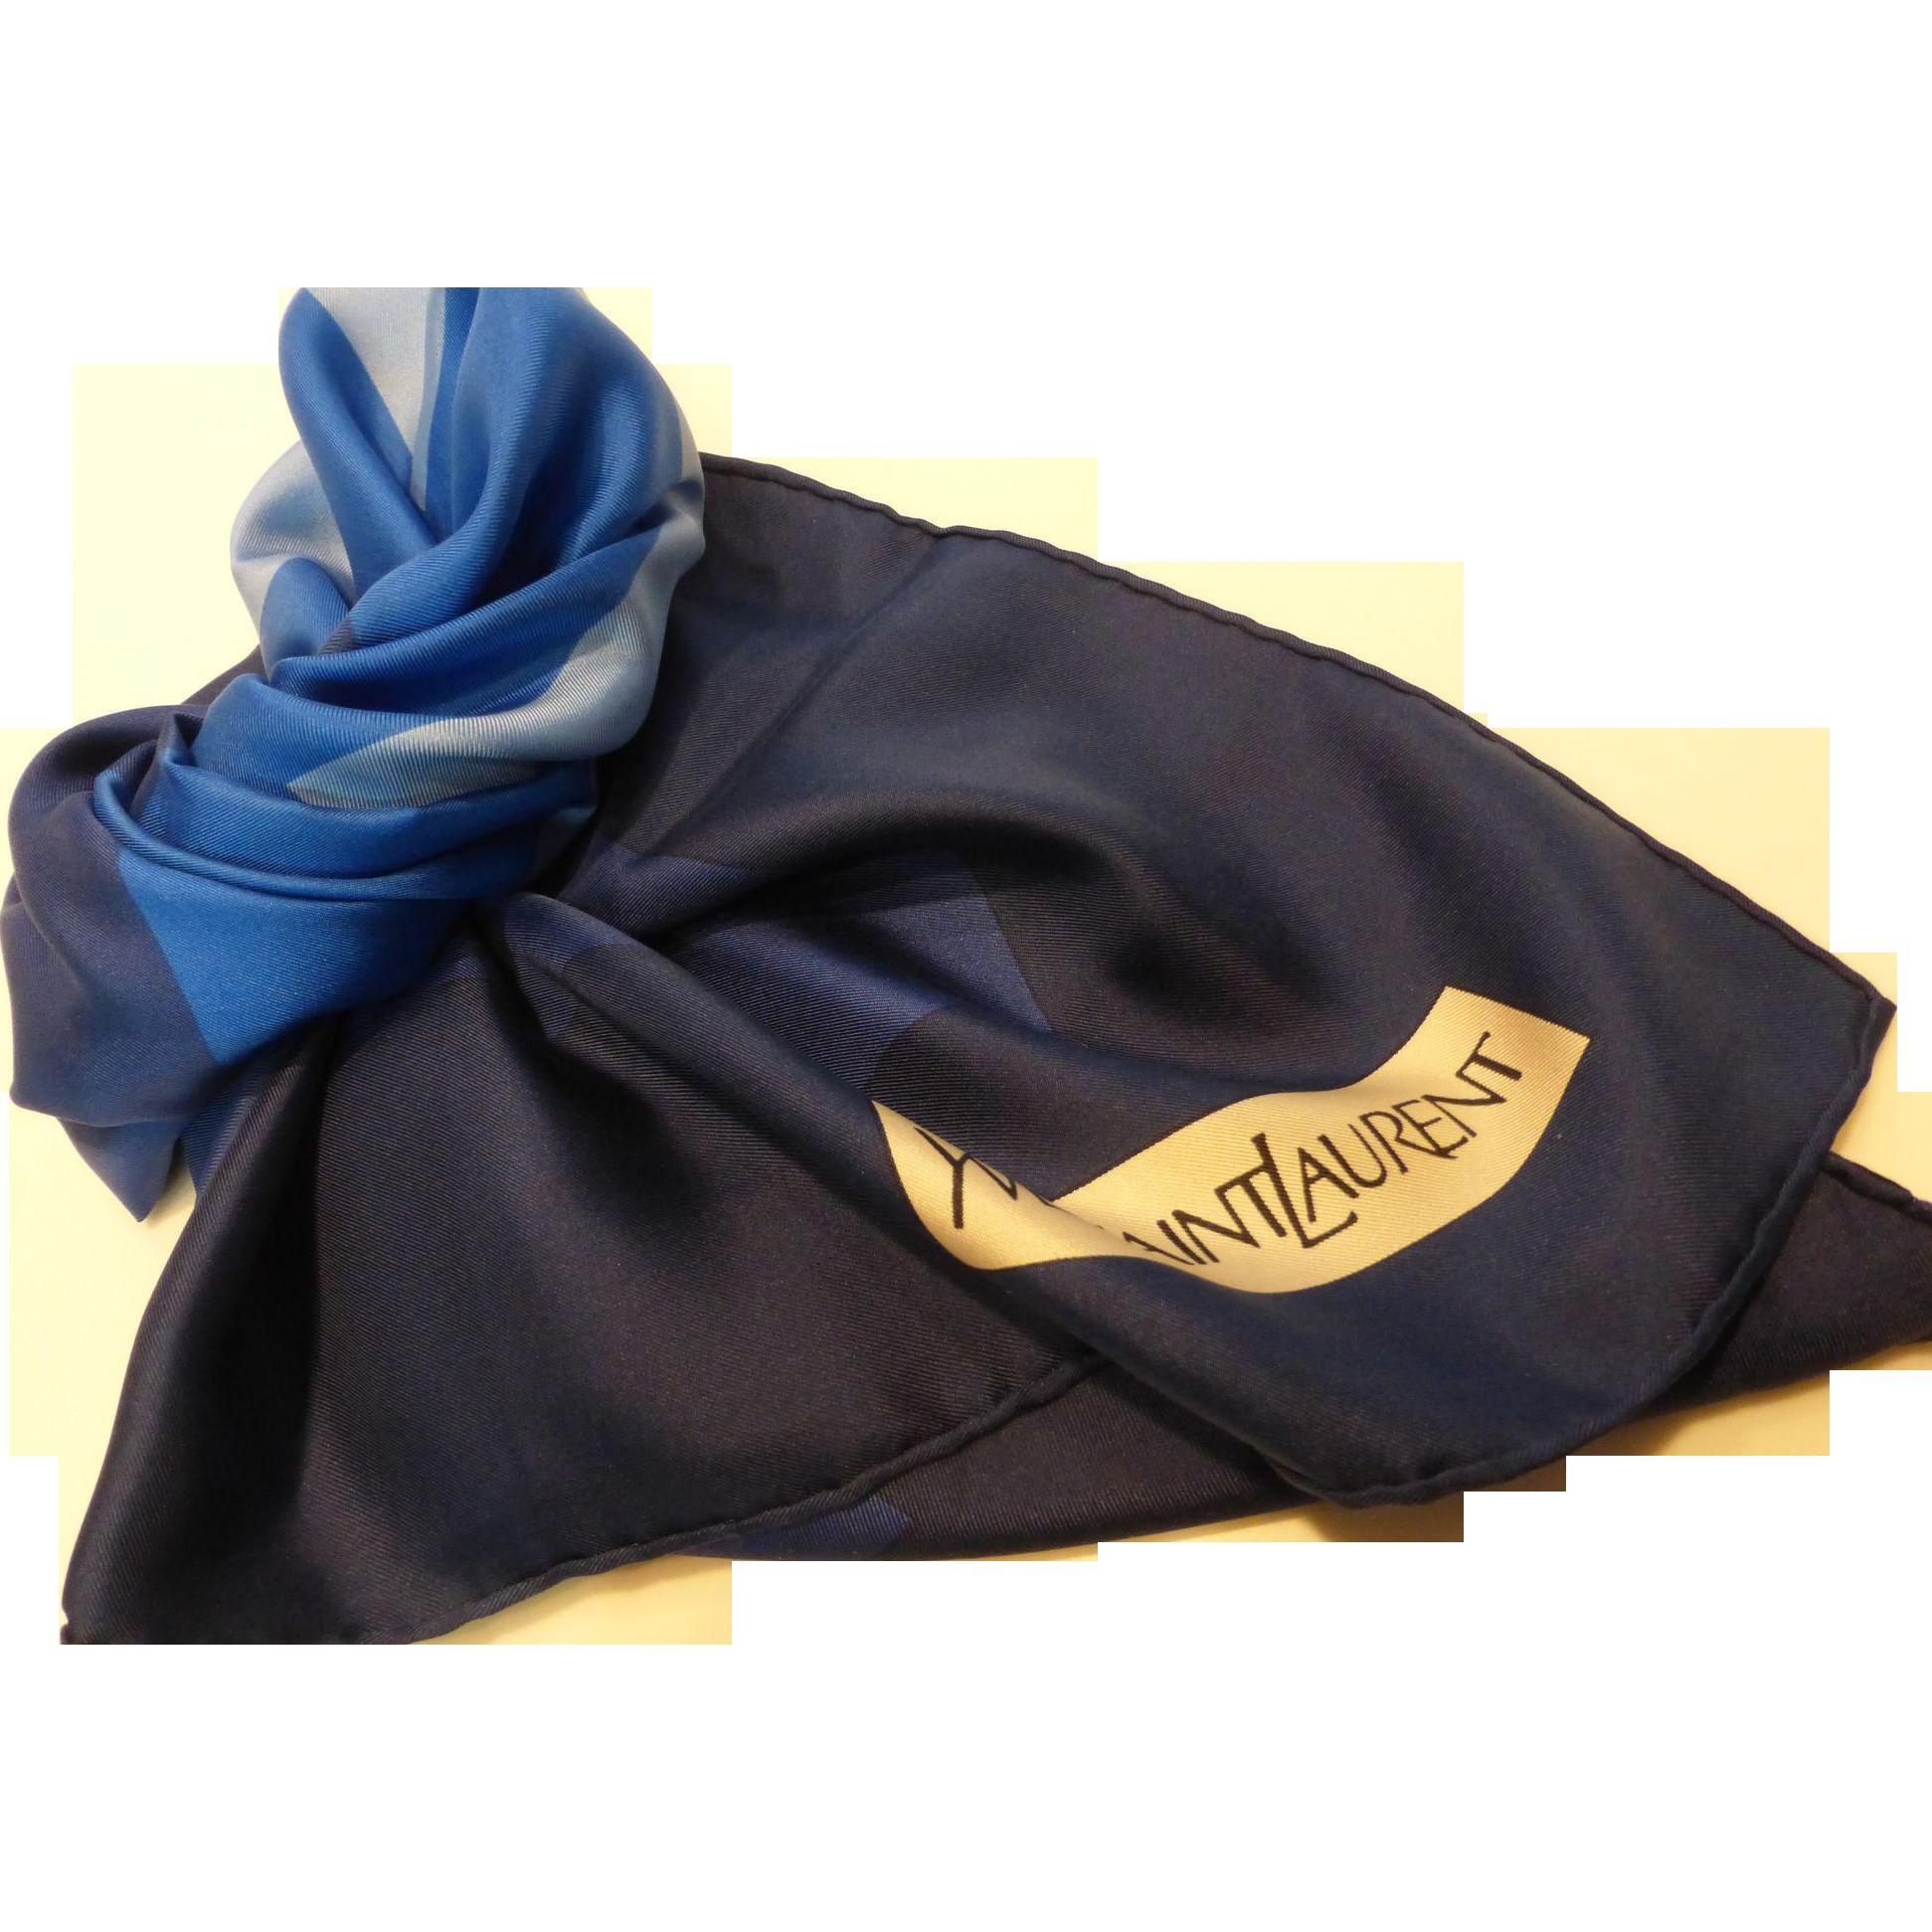 Vintage Yves Saint Laurent Silk Twill Scarf